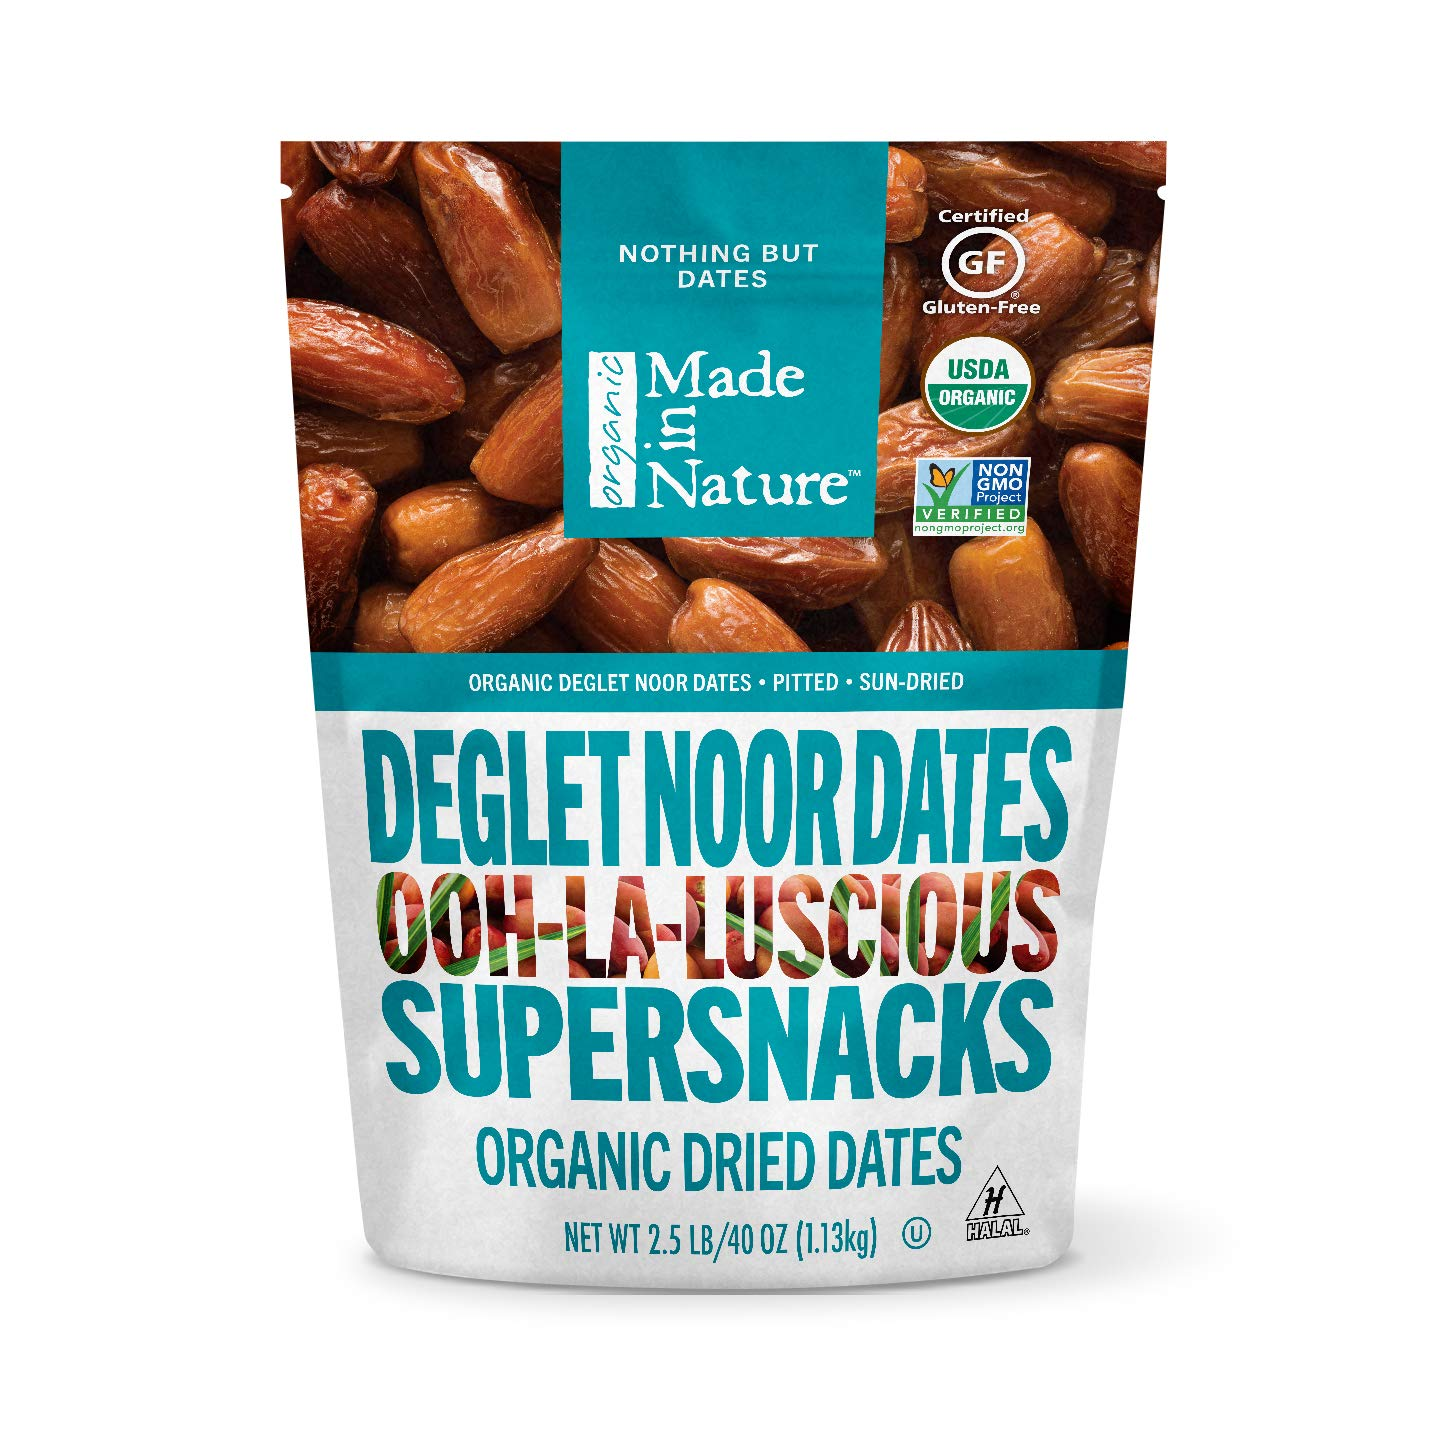 Made in Nature Organic Dried Fruit, Deglet Noor Dates, 40oz Bag – Non-GMO, Unsulfured Vegan Snack